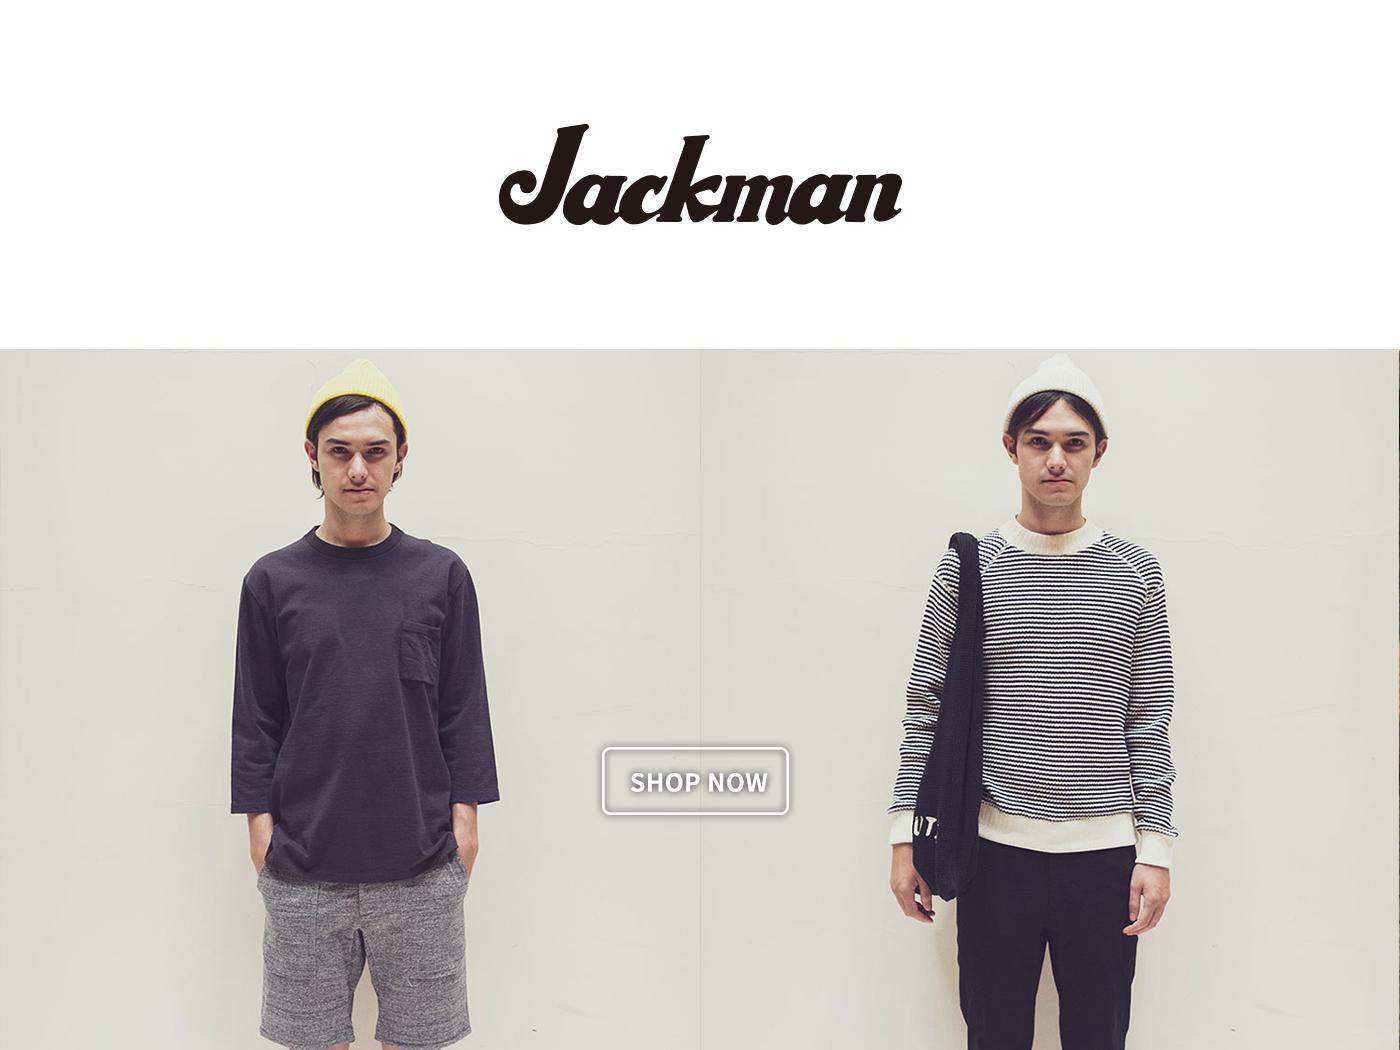 jackman,jackman jp,日本設計服裝,日本服裝,日本服裝品牌,